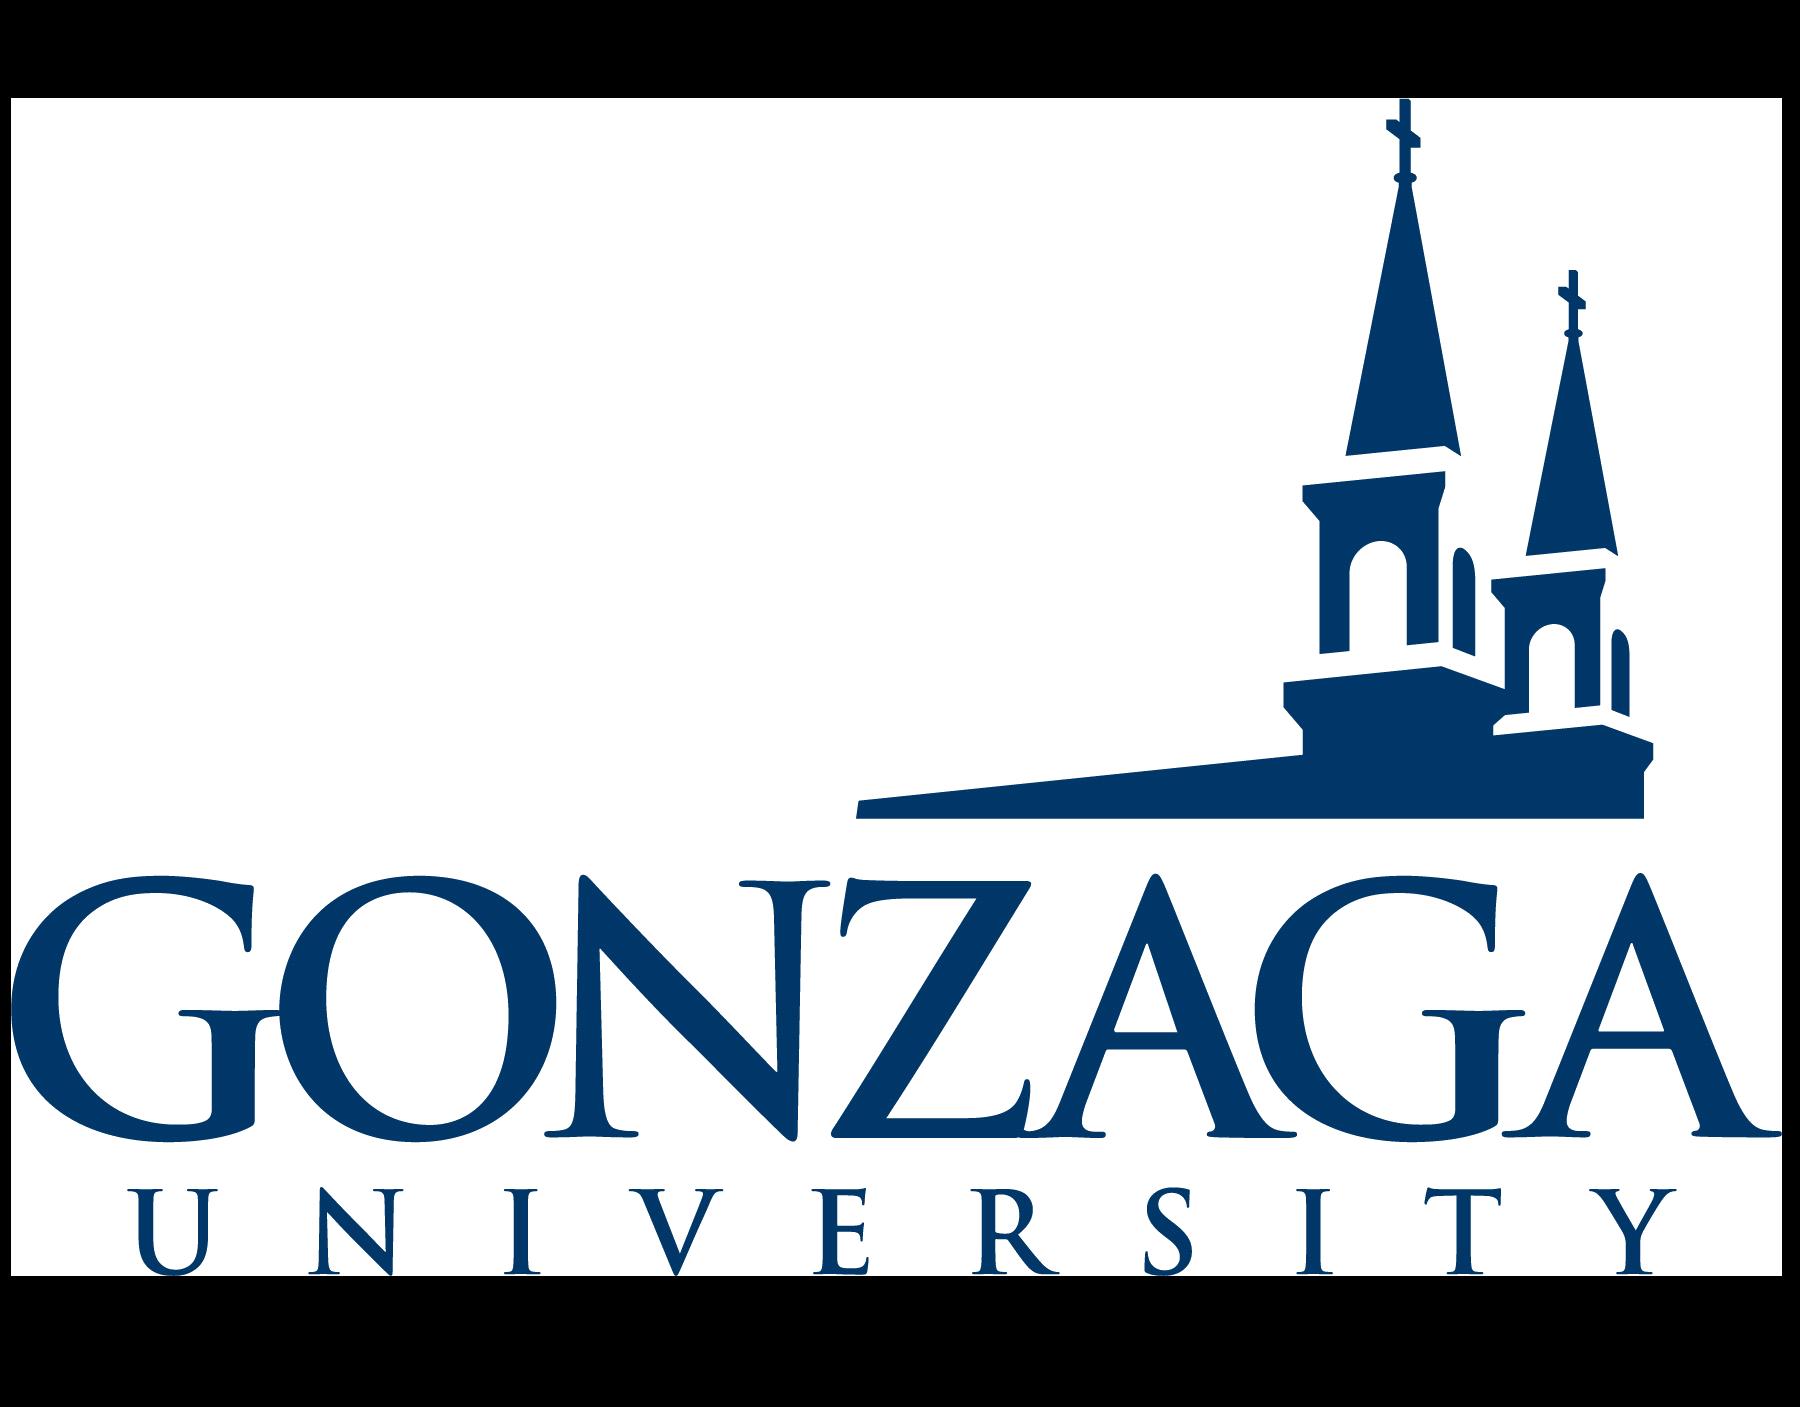 gonzaga_university_logo_png.png